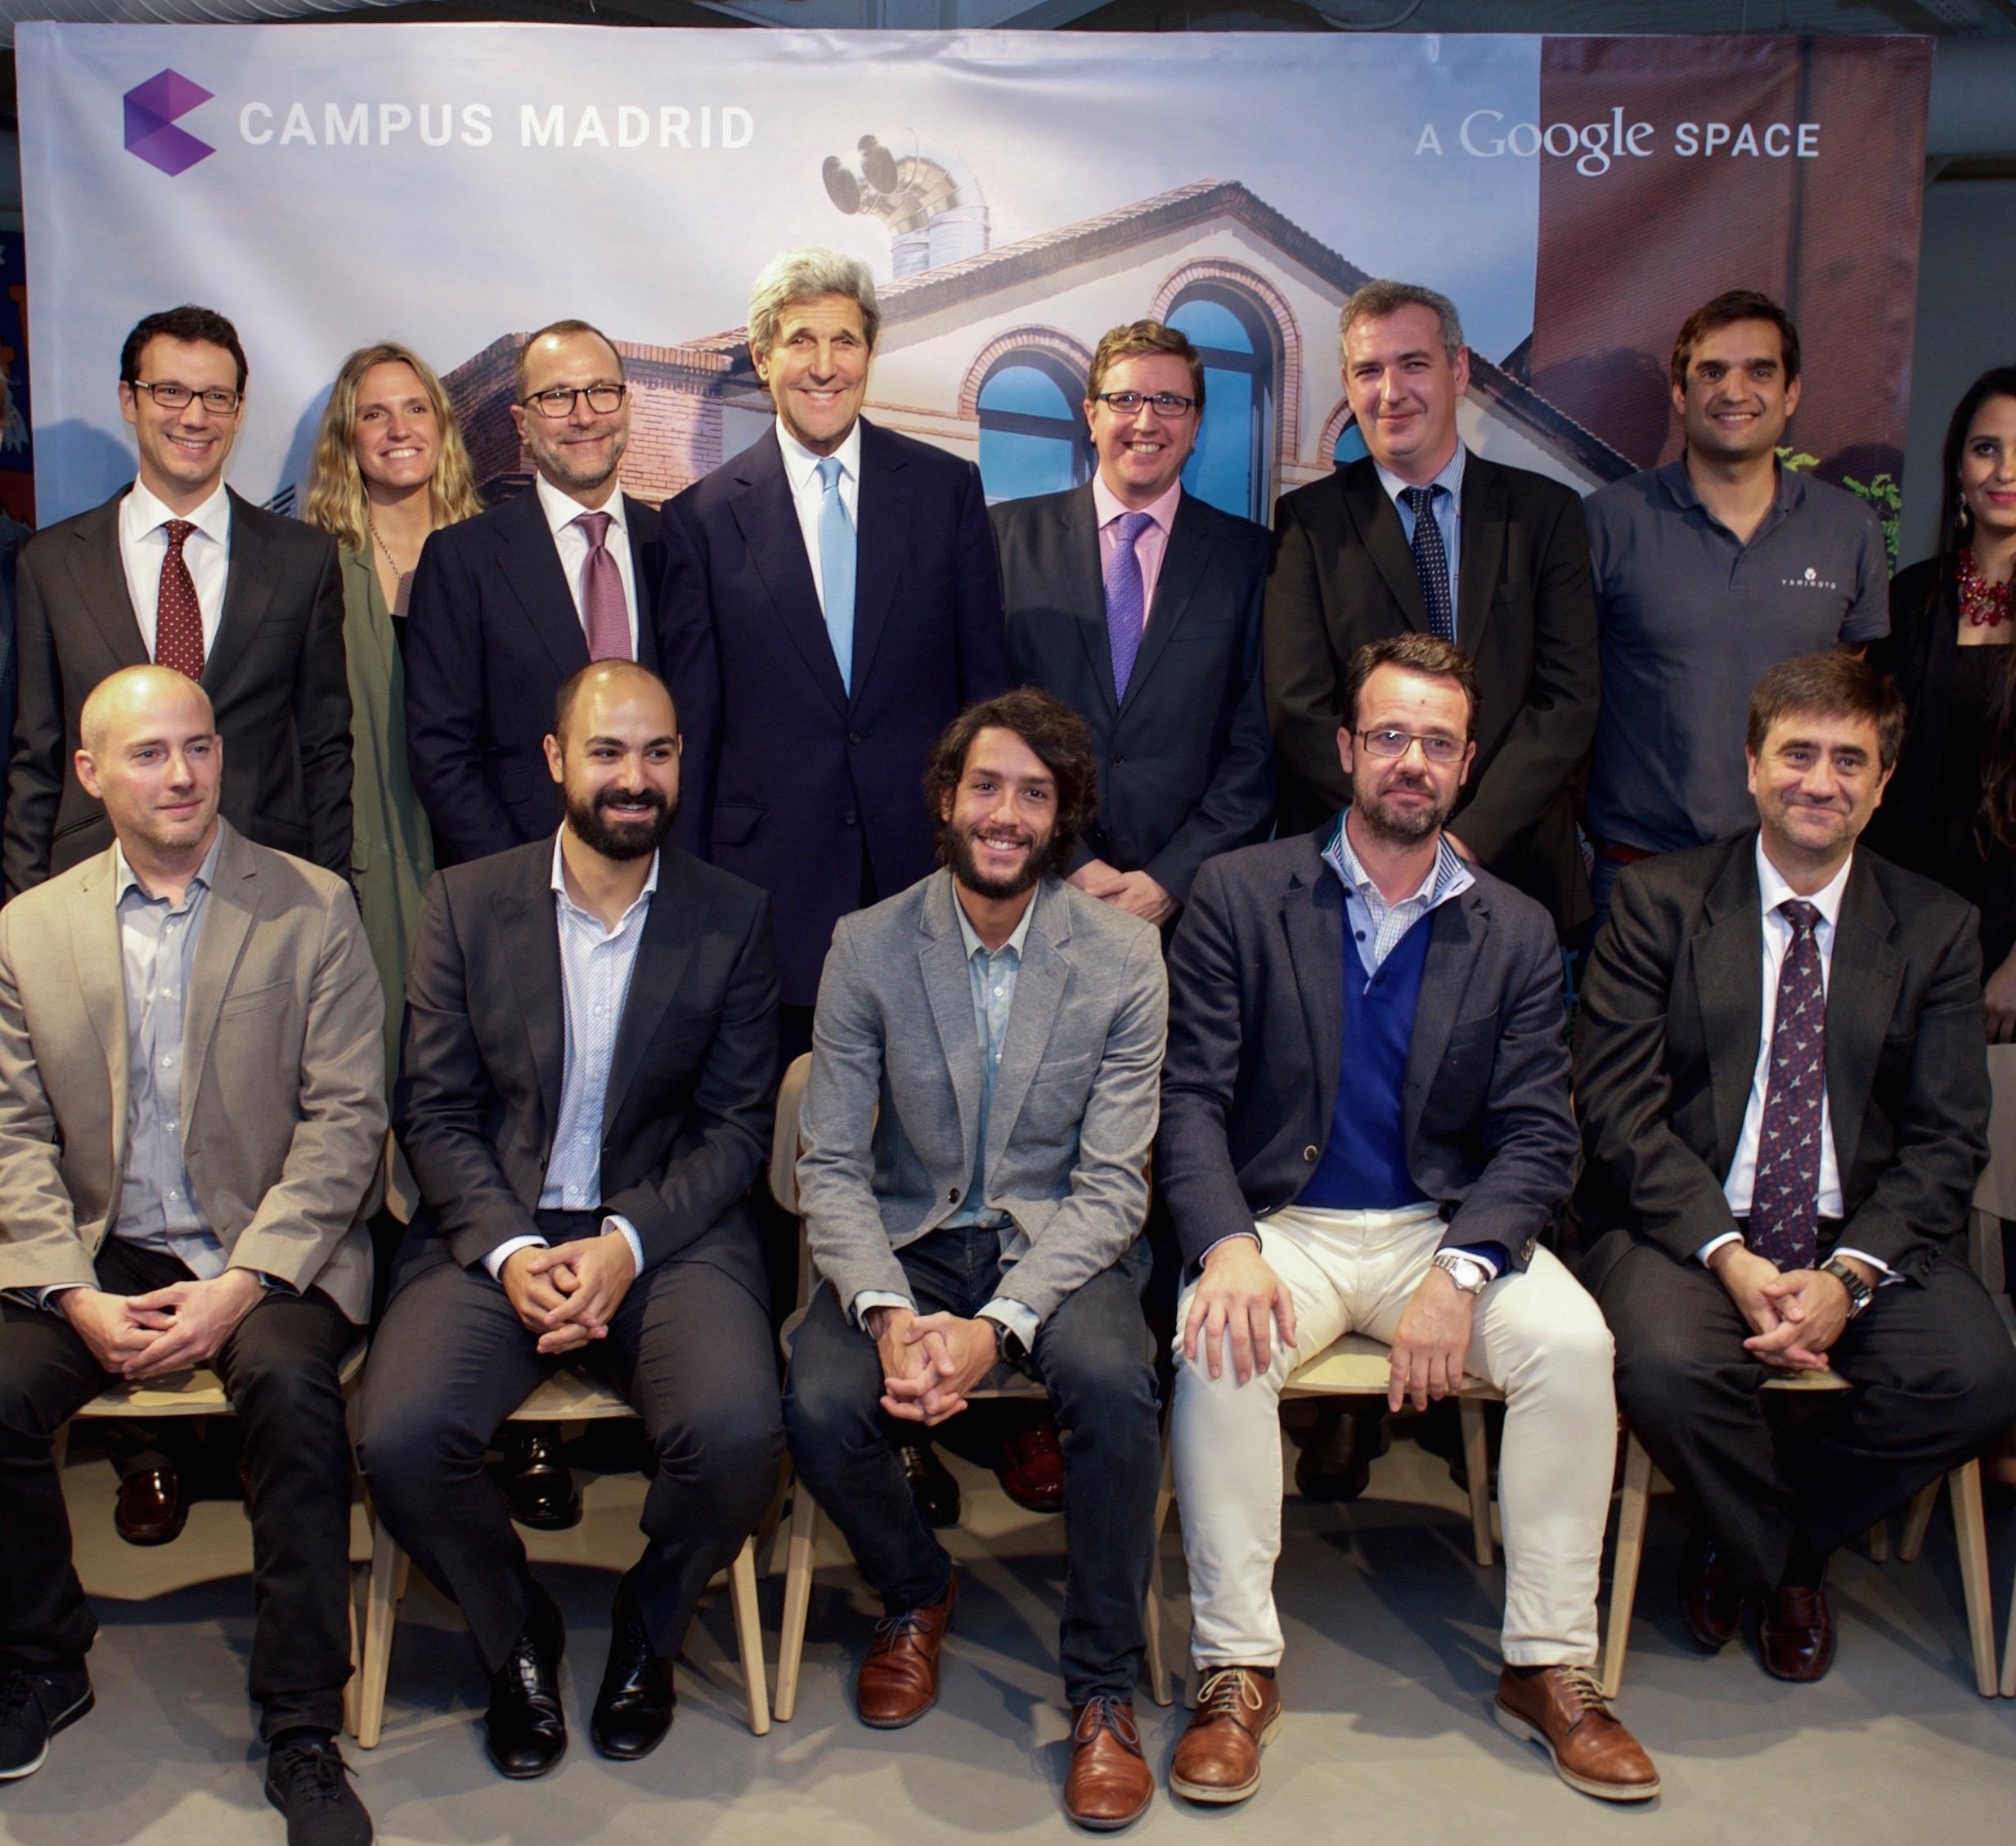 Spanish leading Technology entrepreneurs meet John Kerry